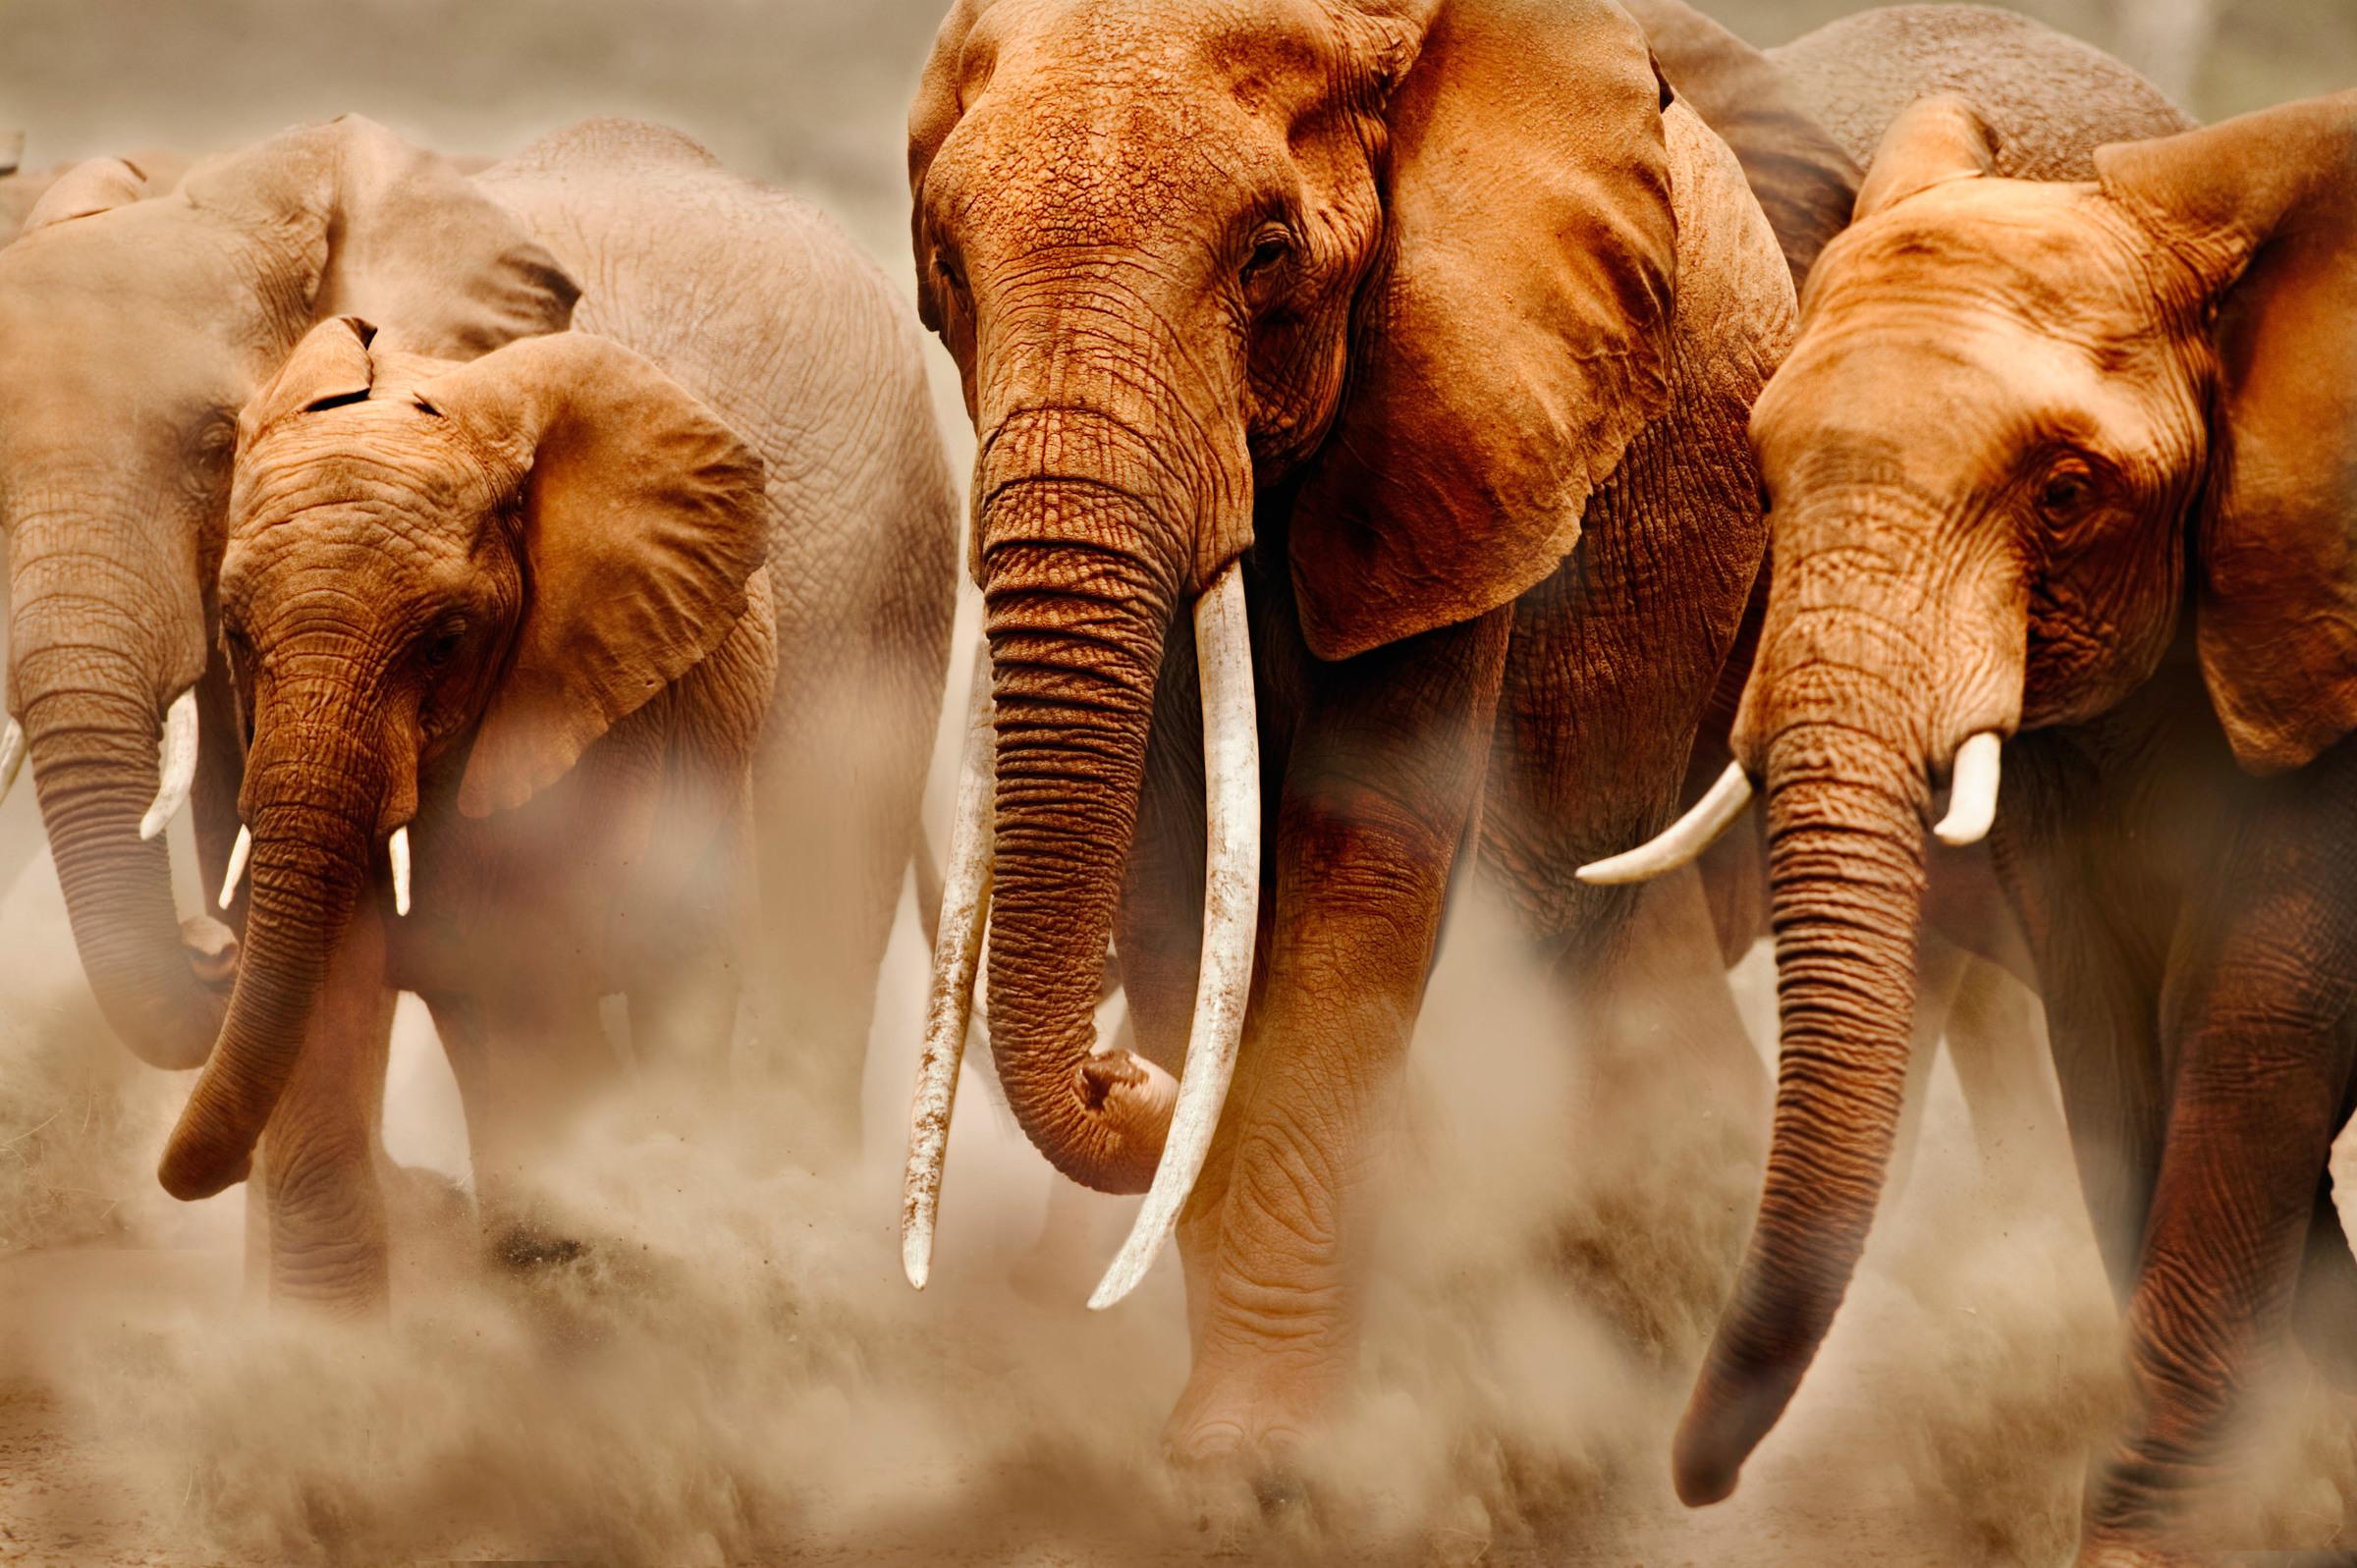 World elephant day help stop ivory trade wwf biocorpaavc Gallery